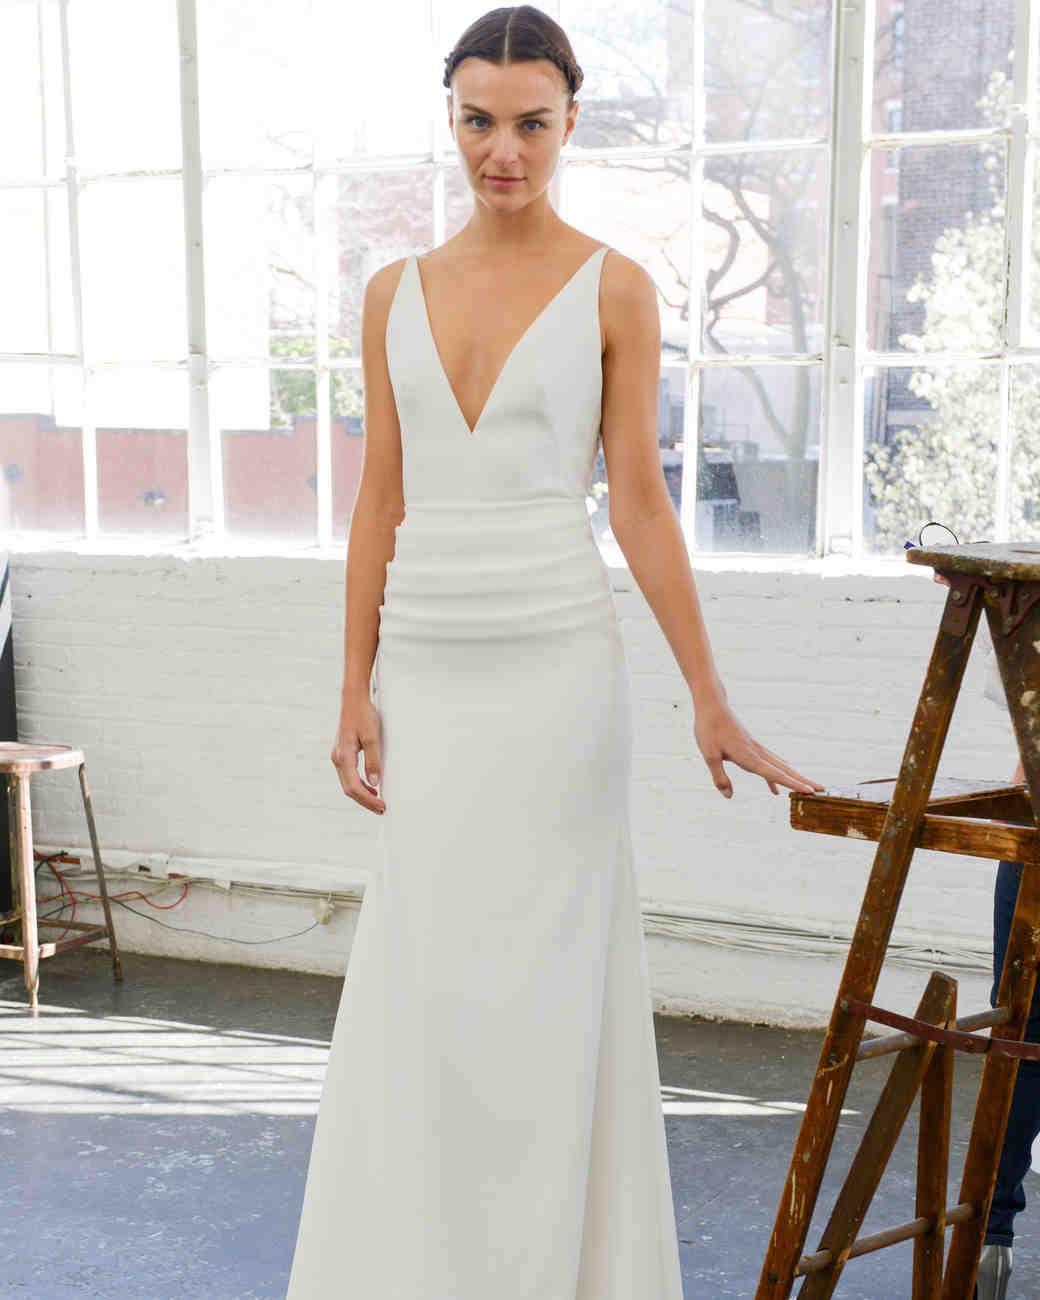 ad33088632c Lela Rose Spring 2017 Wedding Dress Collection